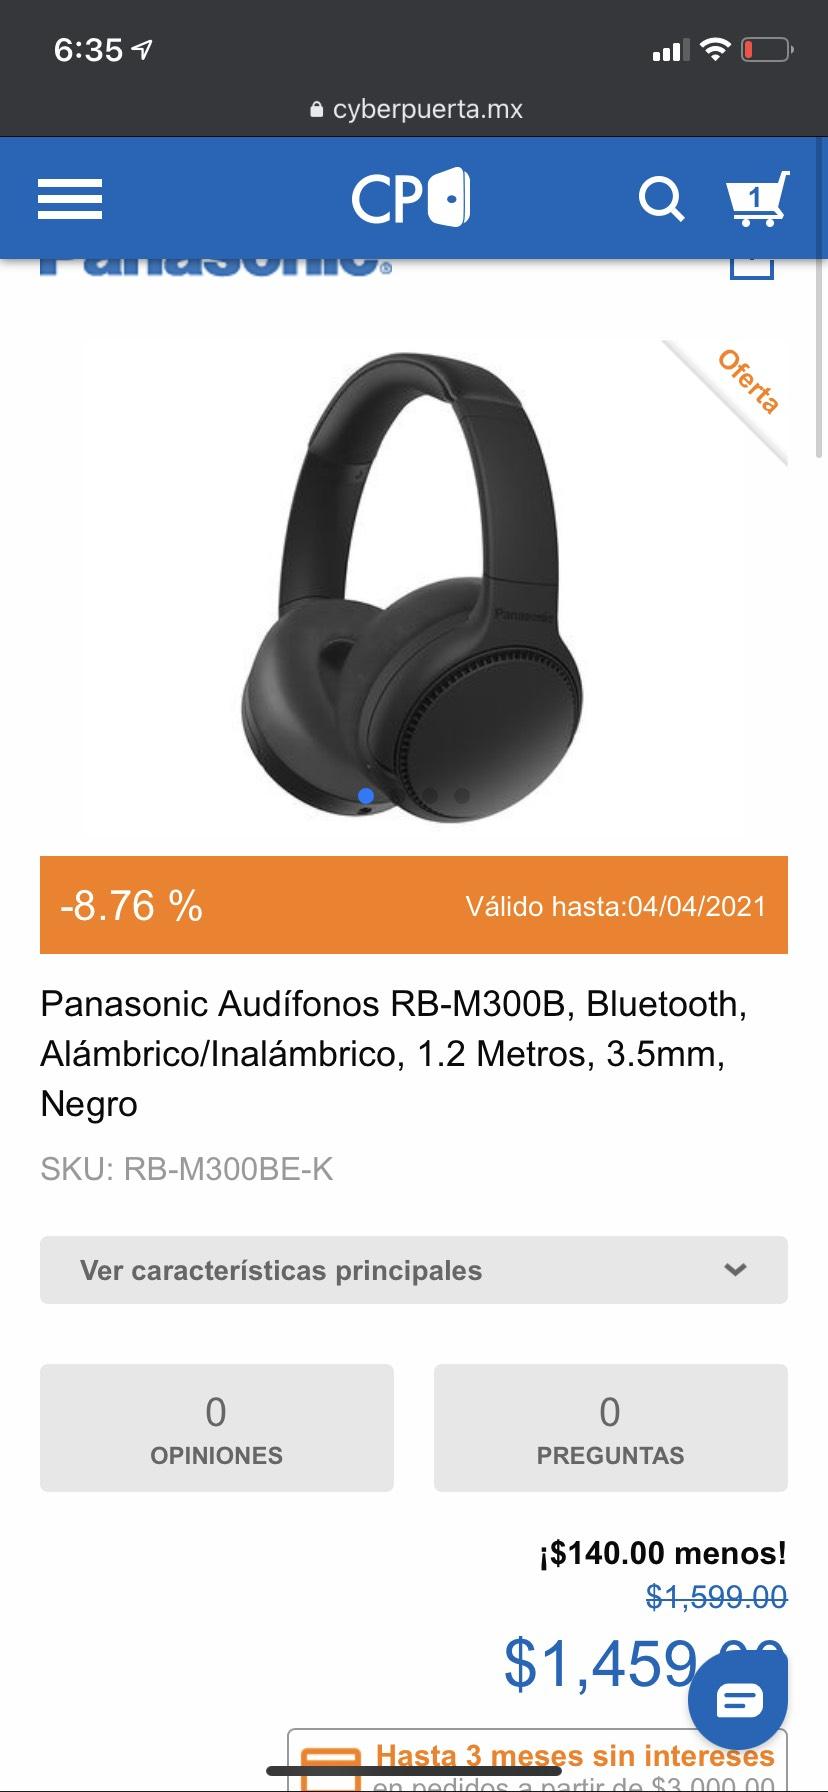 Cyberpuerta: Panasonic RB-M300B